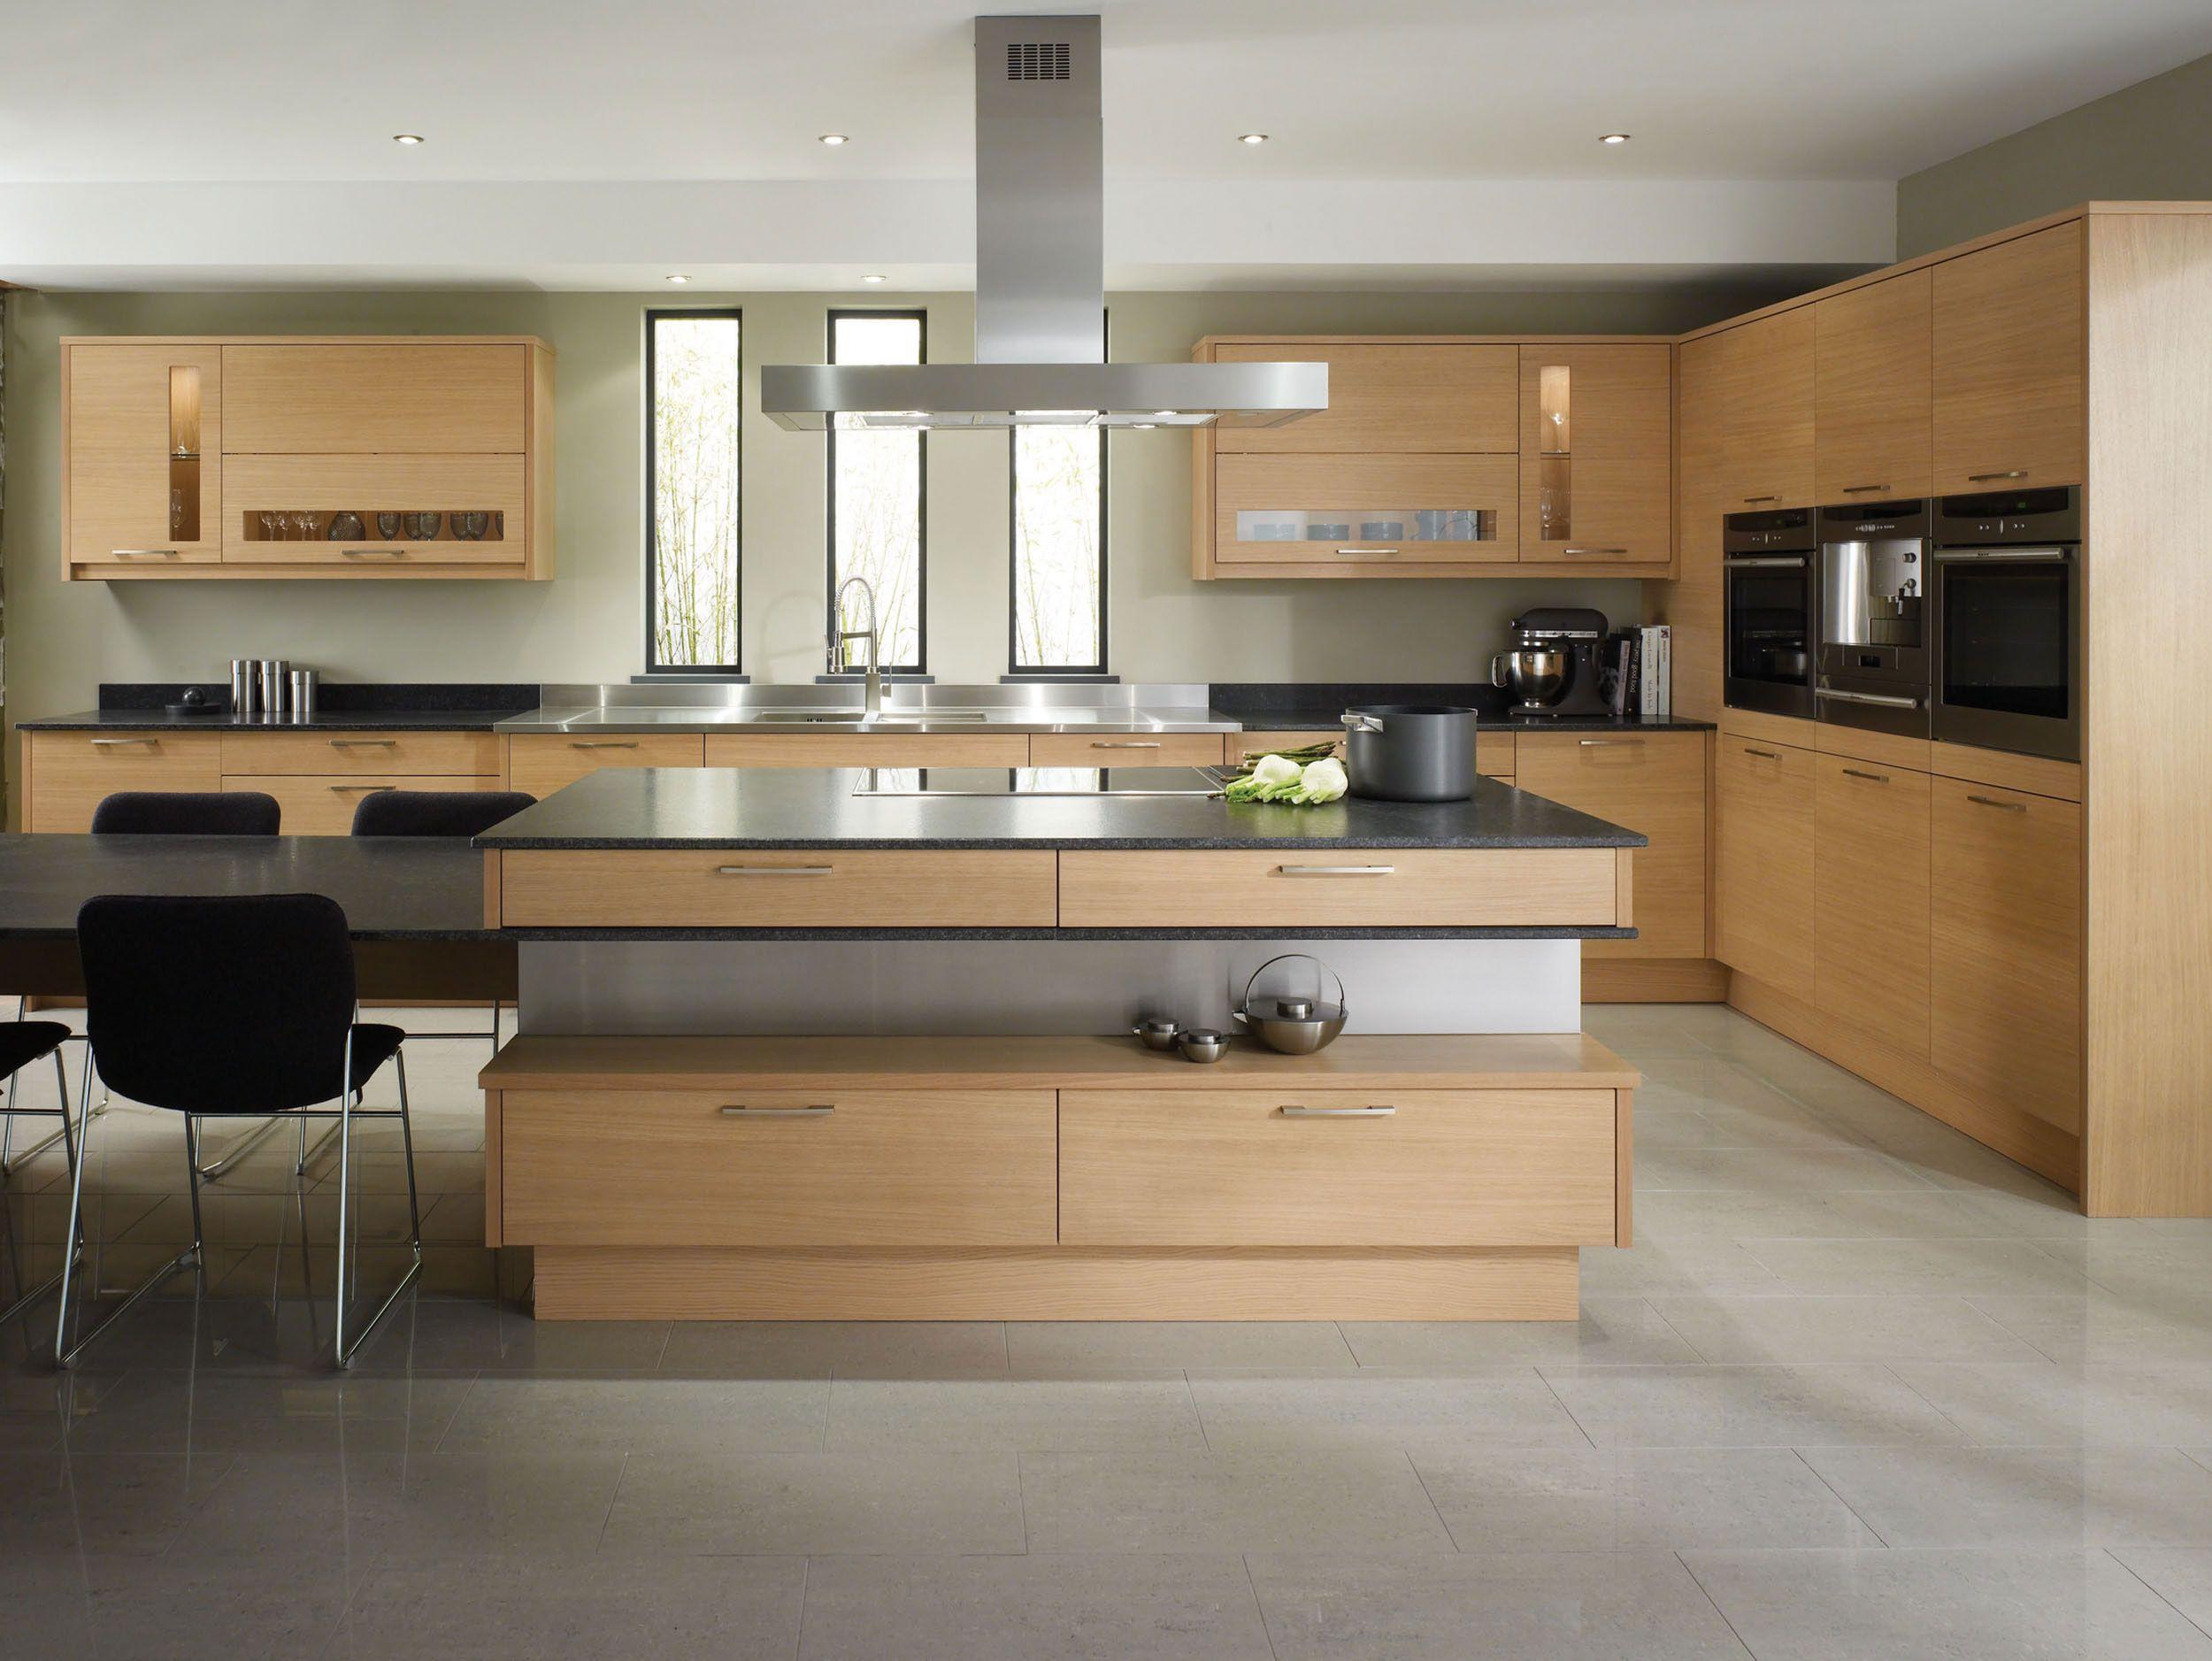 25 Contemporary Kitchen Design Inspiration Contemporary Kitchen Cabinets Contemporary Kitchen Design Contemporary Kitchen